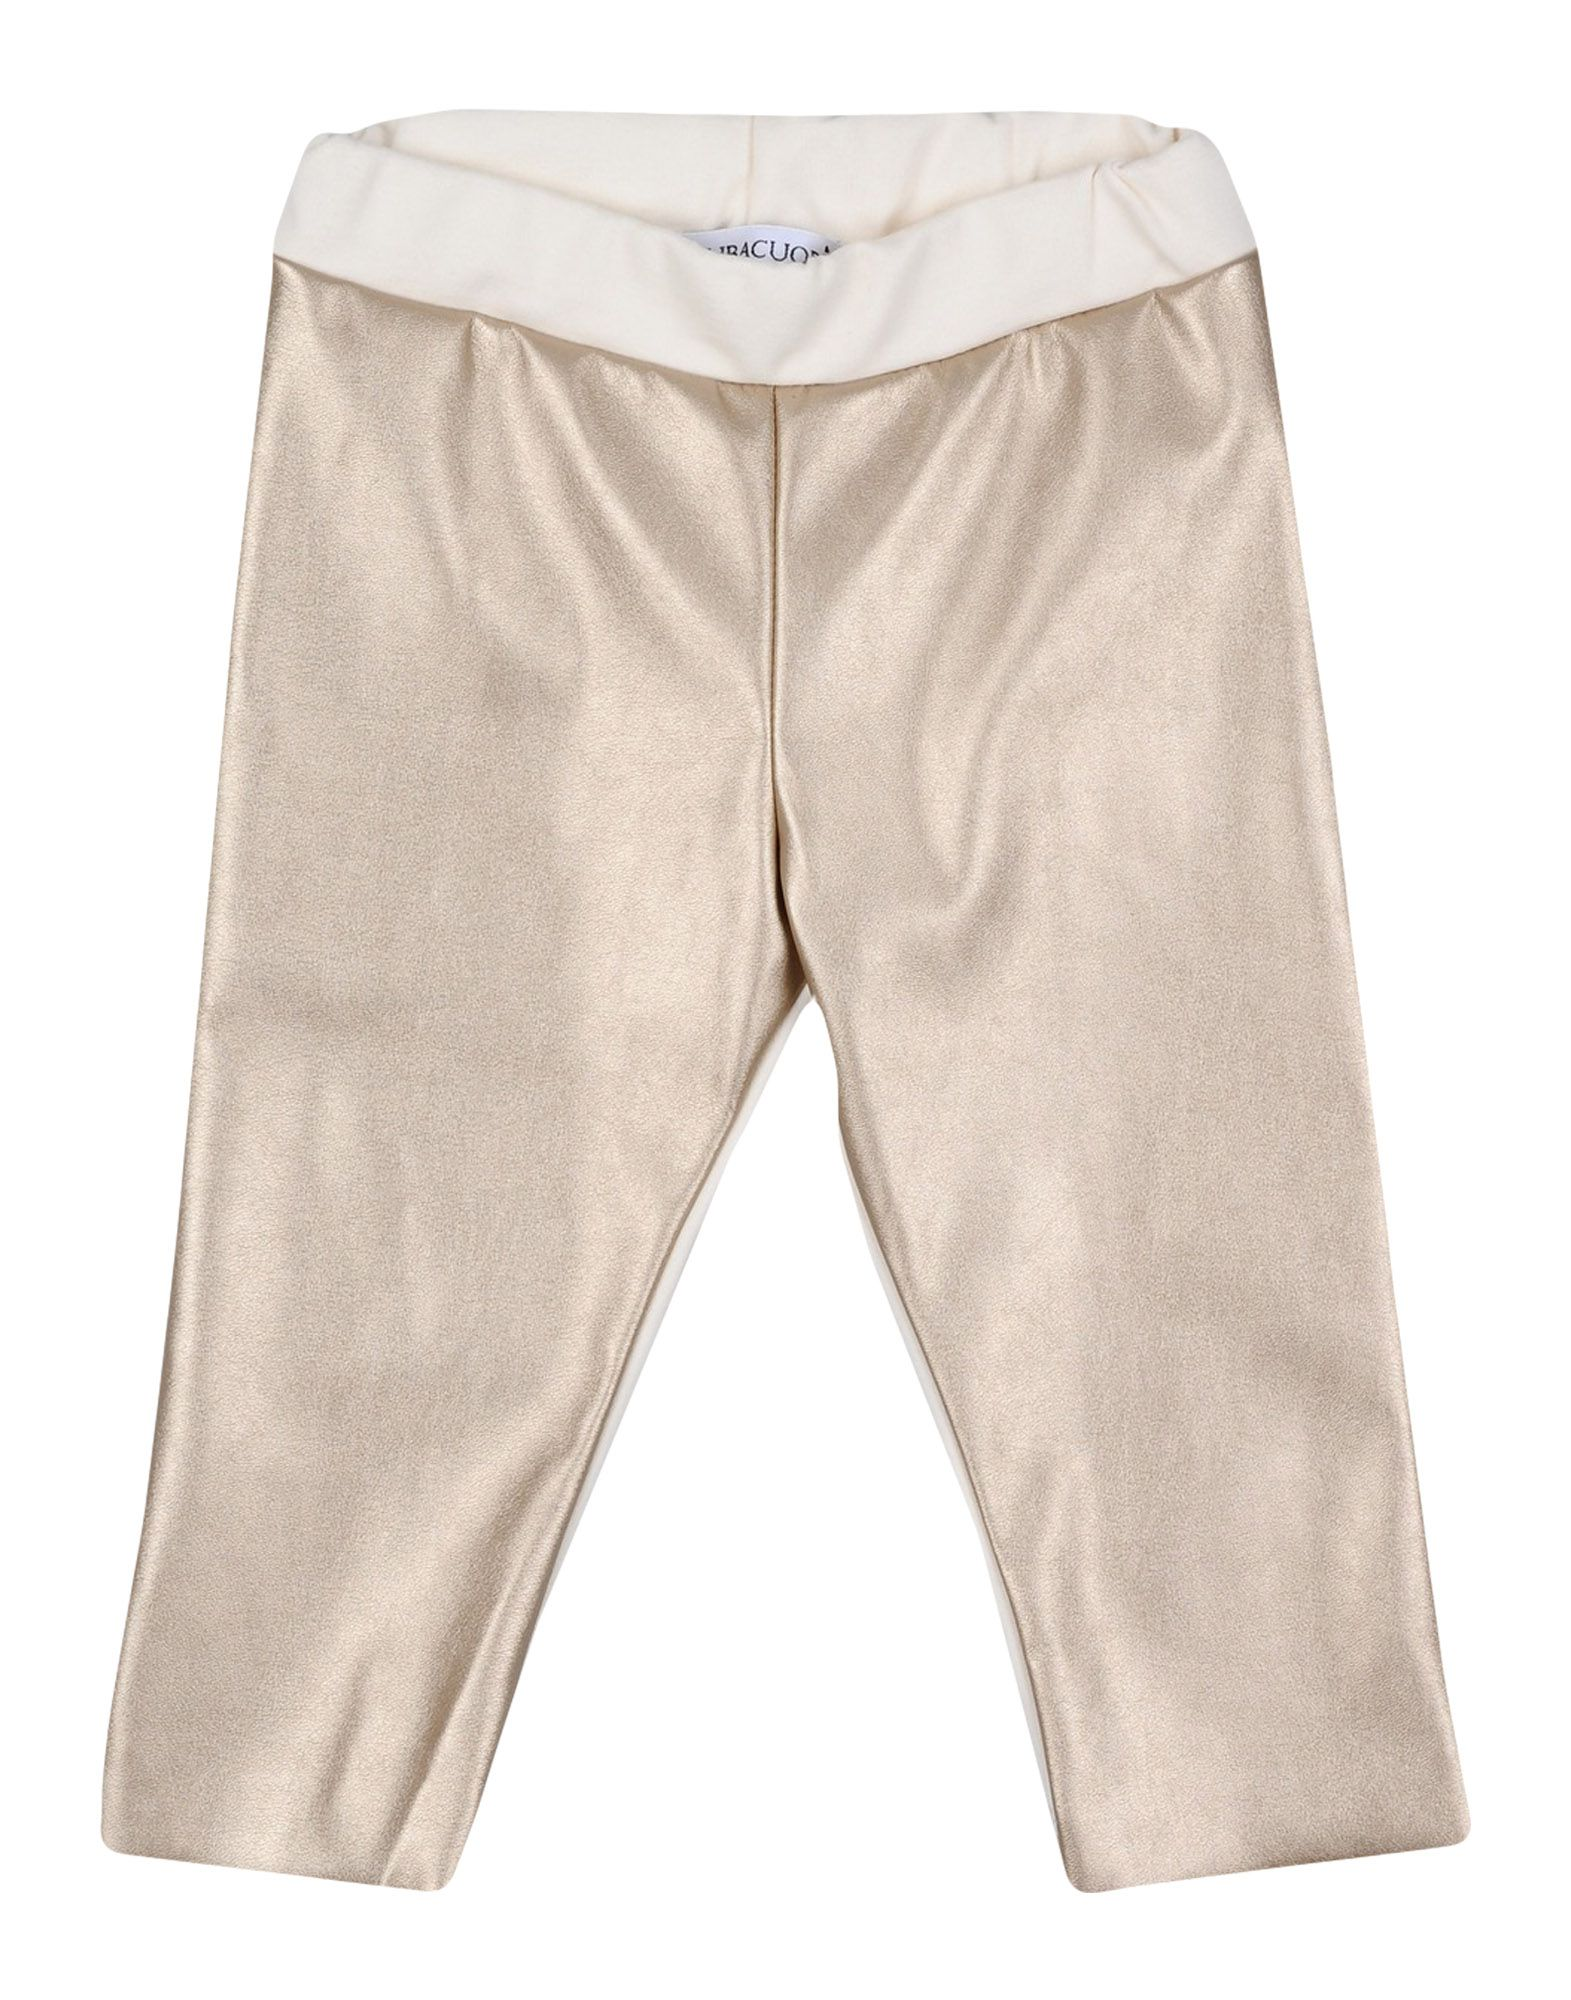 Pantalone Rubacuori Bebe' donna - 13032969DG 13032969DG 13032969DG e88